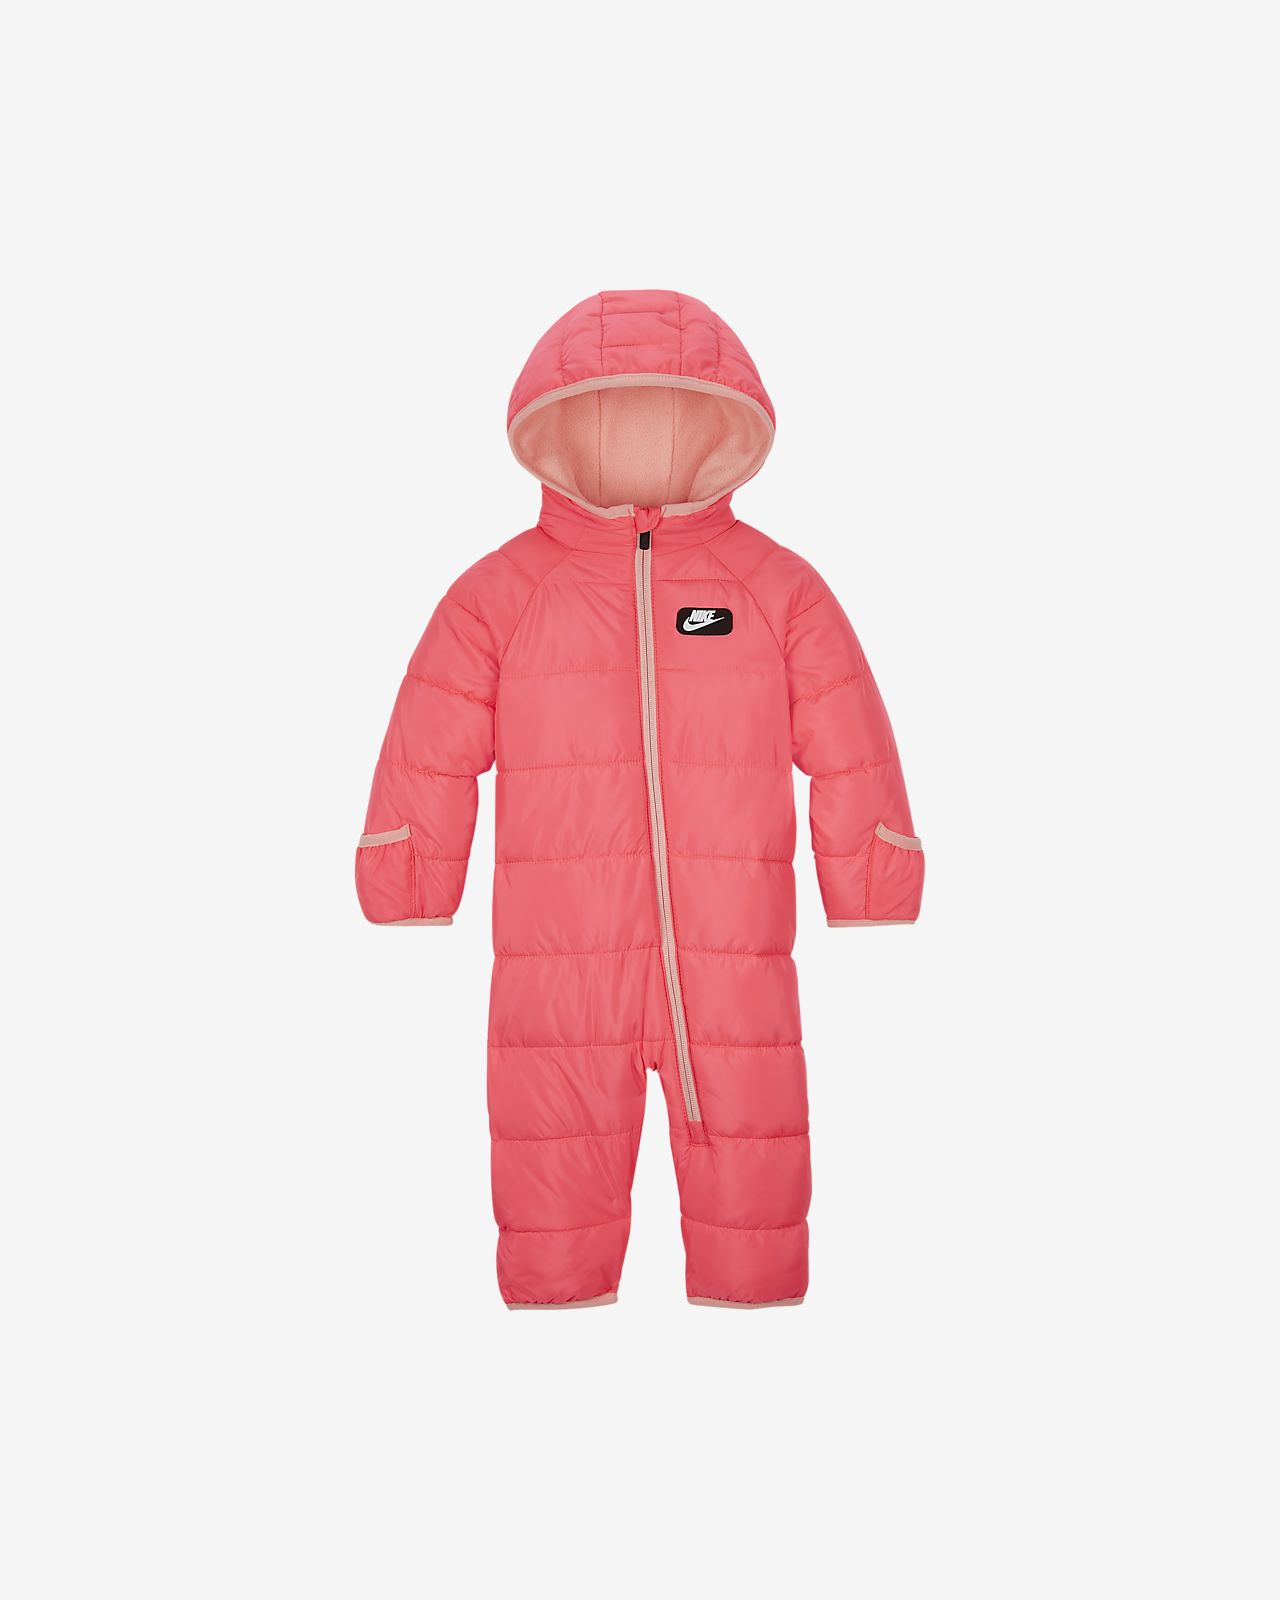 Nike Baby (12–24M) Puffer Snowsuit